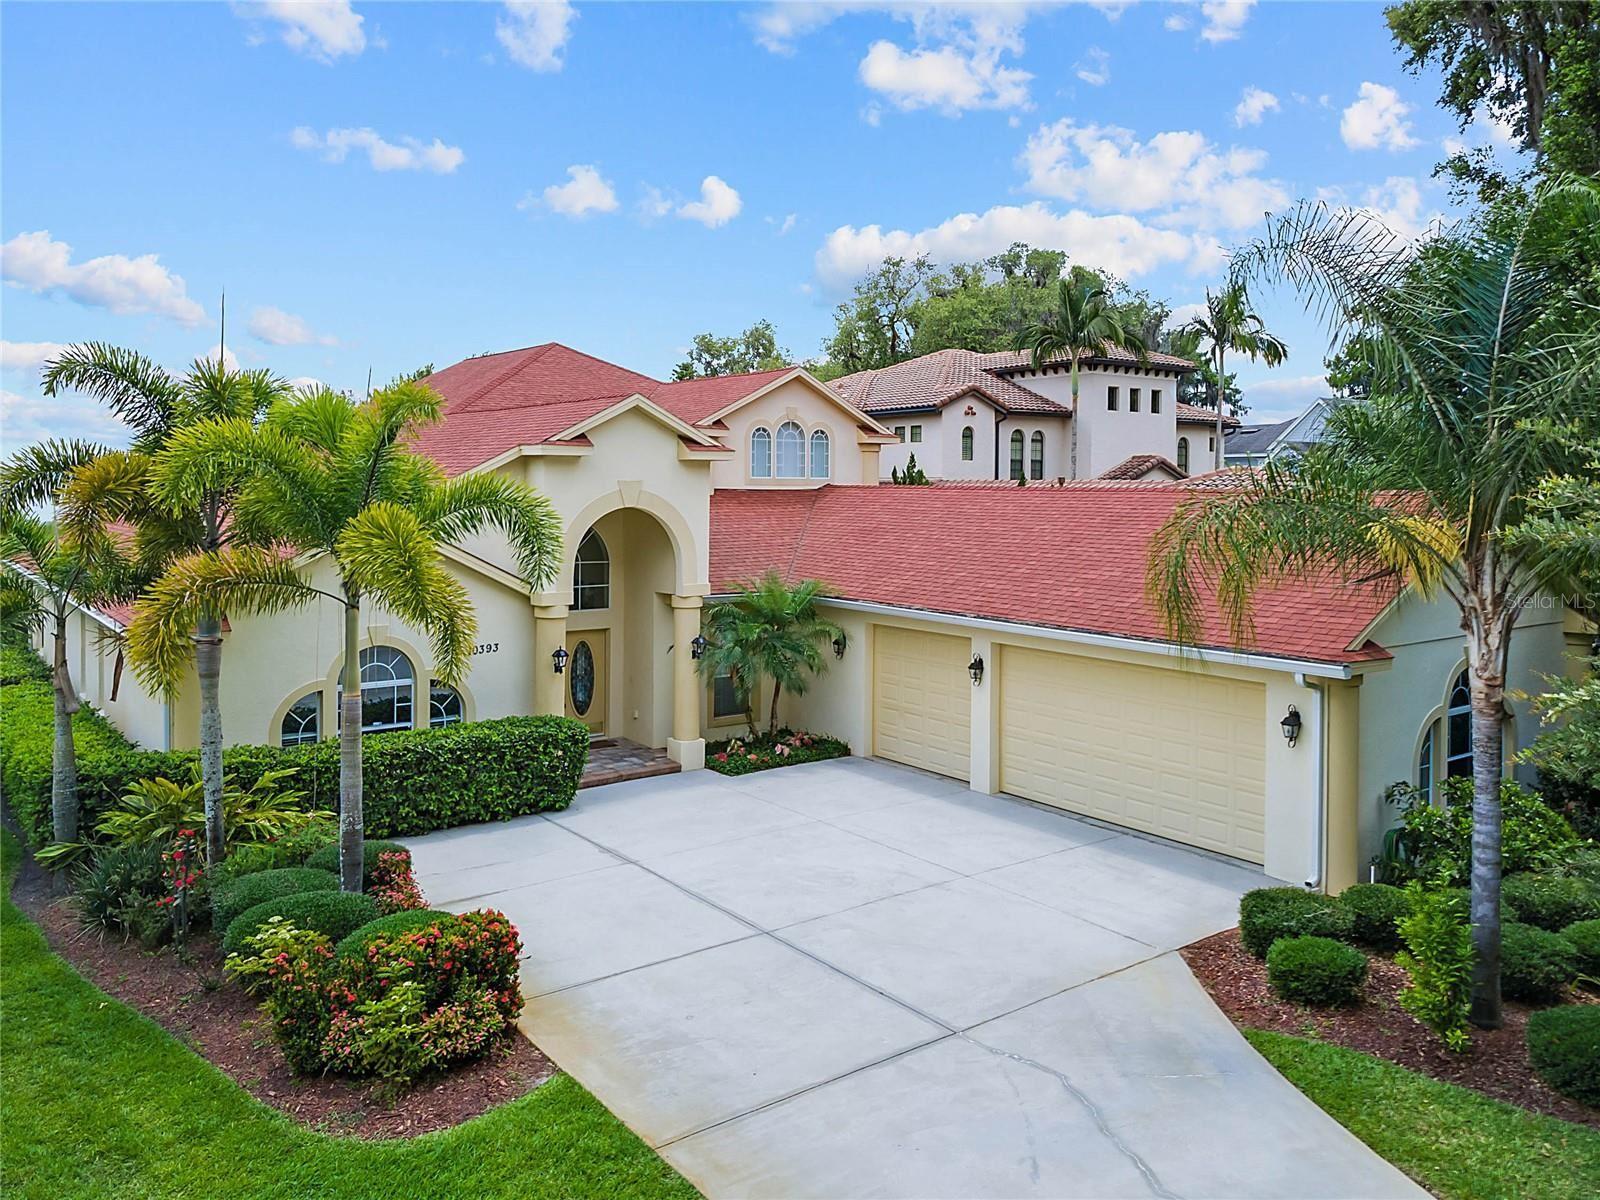 10393 HART BRANCH CIRCLE, Orlando, FL 32832 - #: O5946922